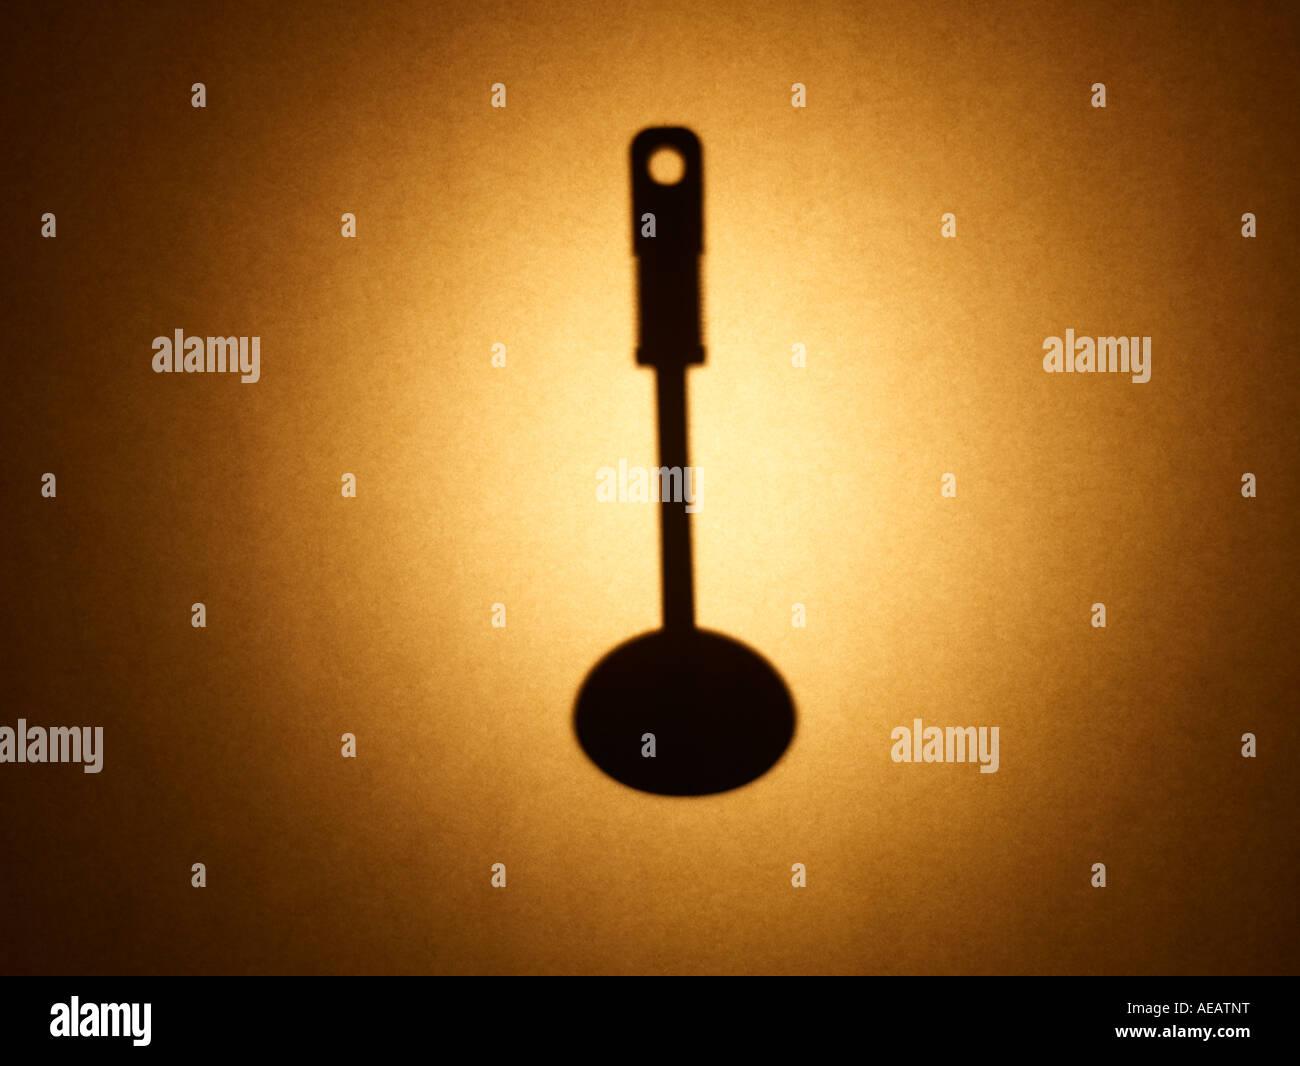 Kitchen utensil - Stock Image